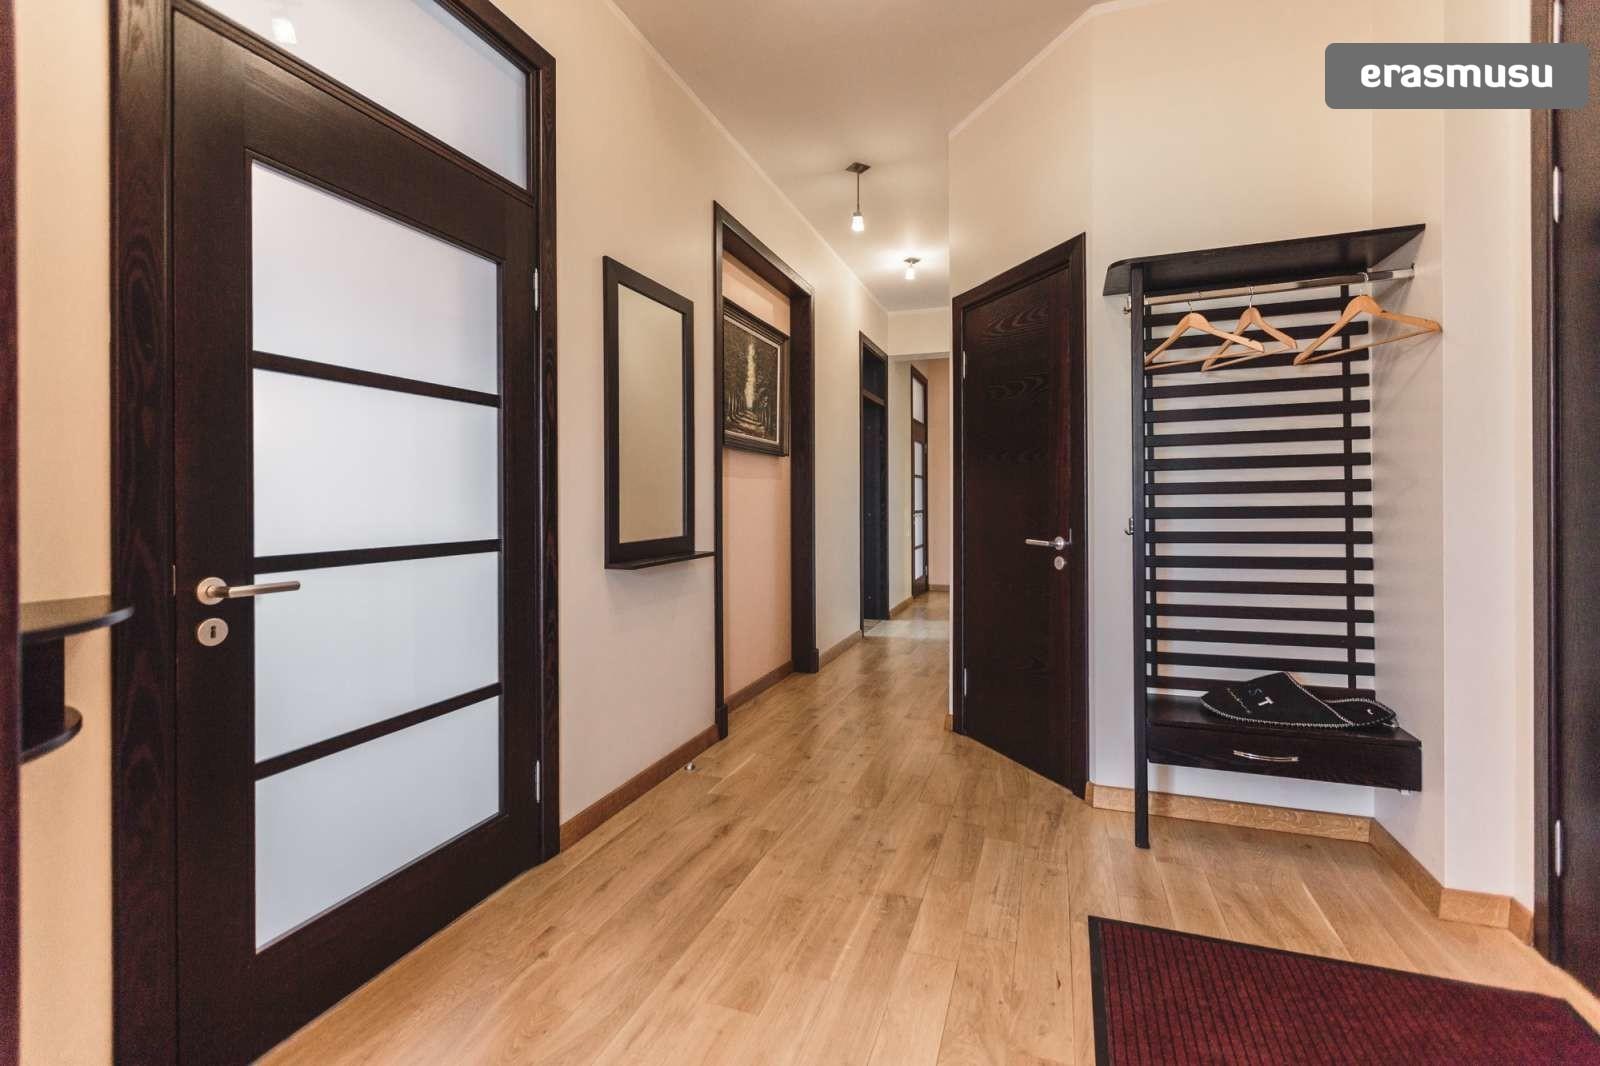 modern-4-bedroom-apartment-rent-centrs-0ccb60c22c8ecfc665c7dd5f9